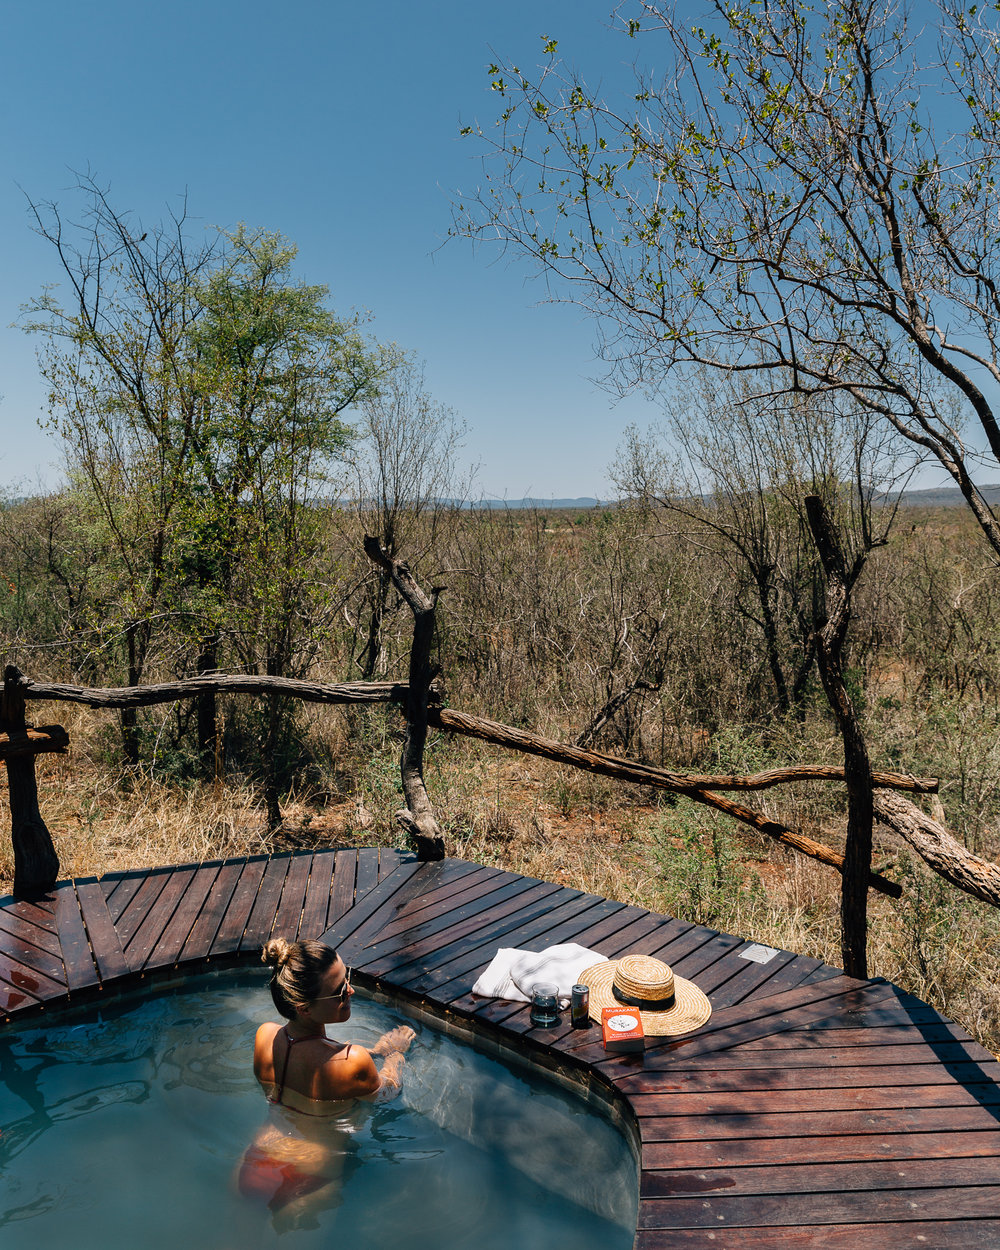 Melissa_Findley-SouthAfrica-Blog-19.jpg